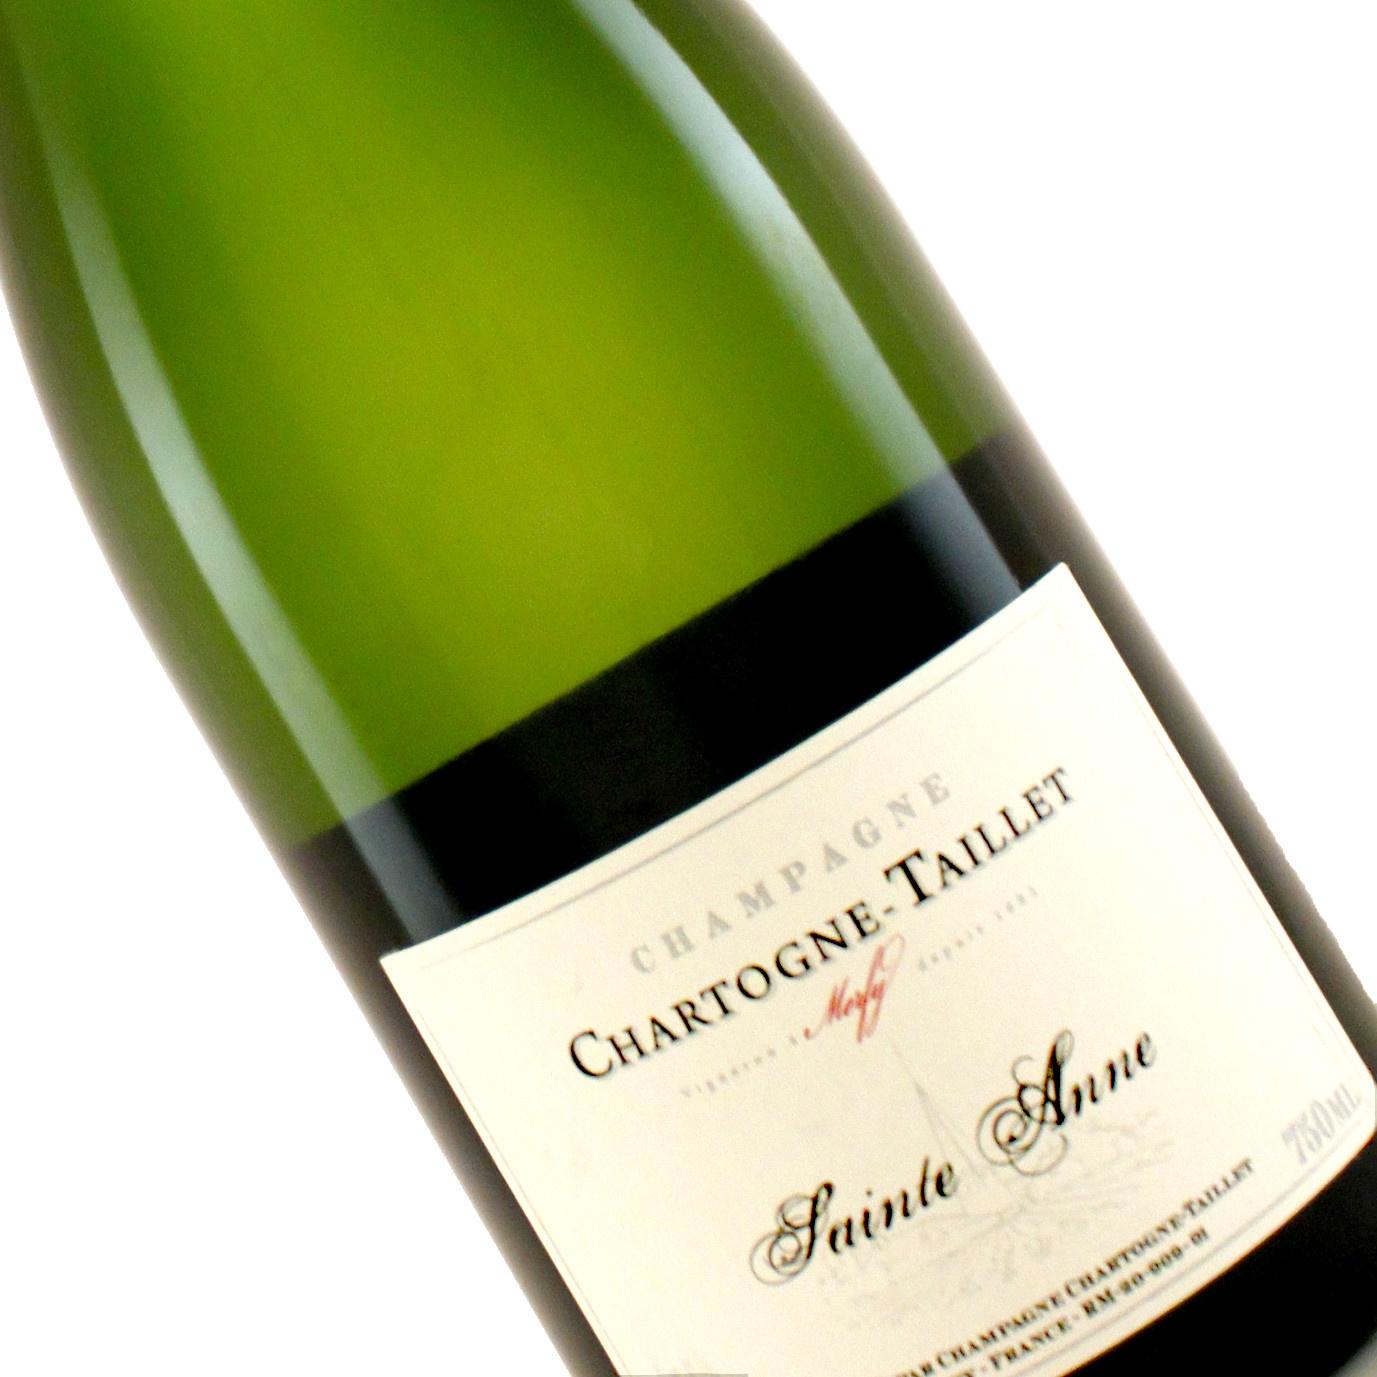 "Chartogne-Taillet N.V. Champagne Brut ""Sainte Anne"""